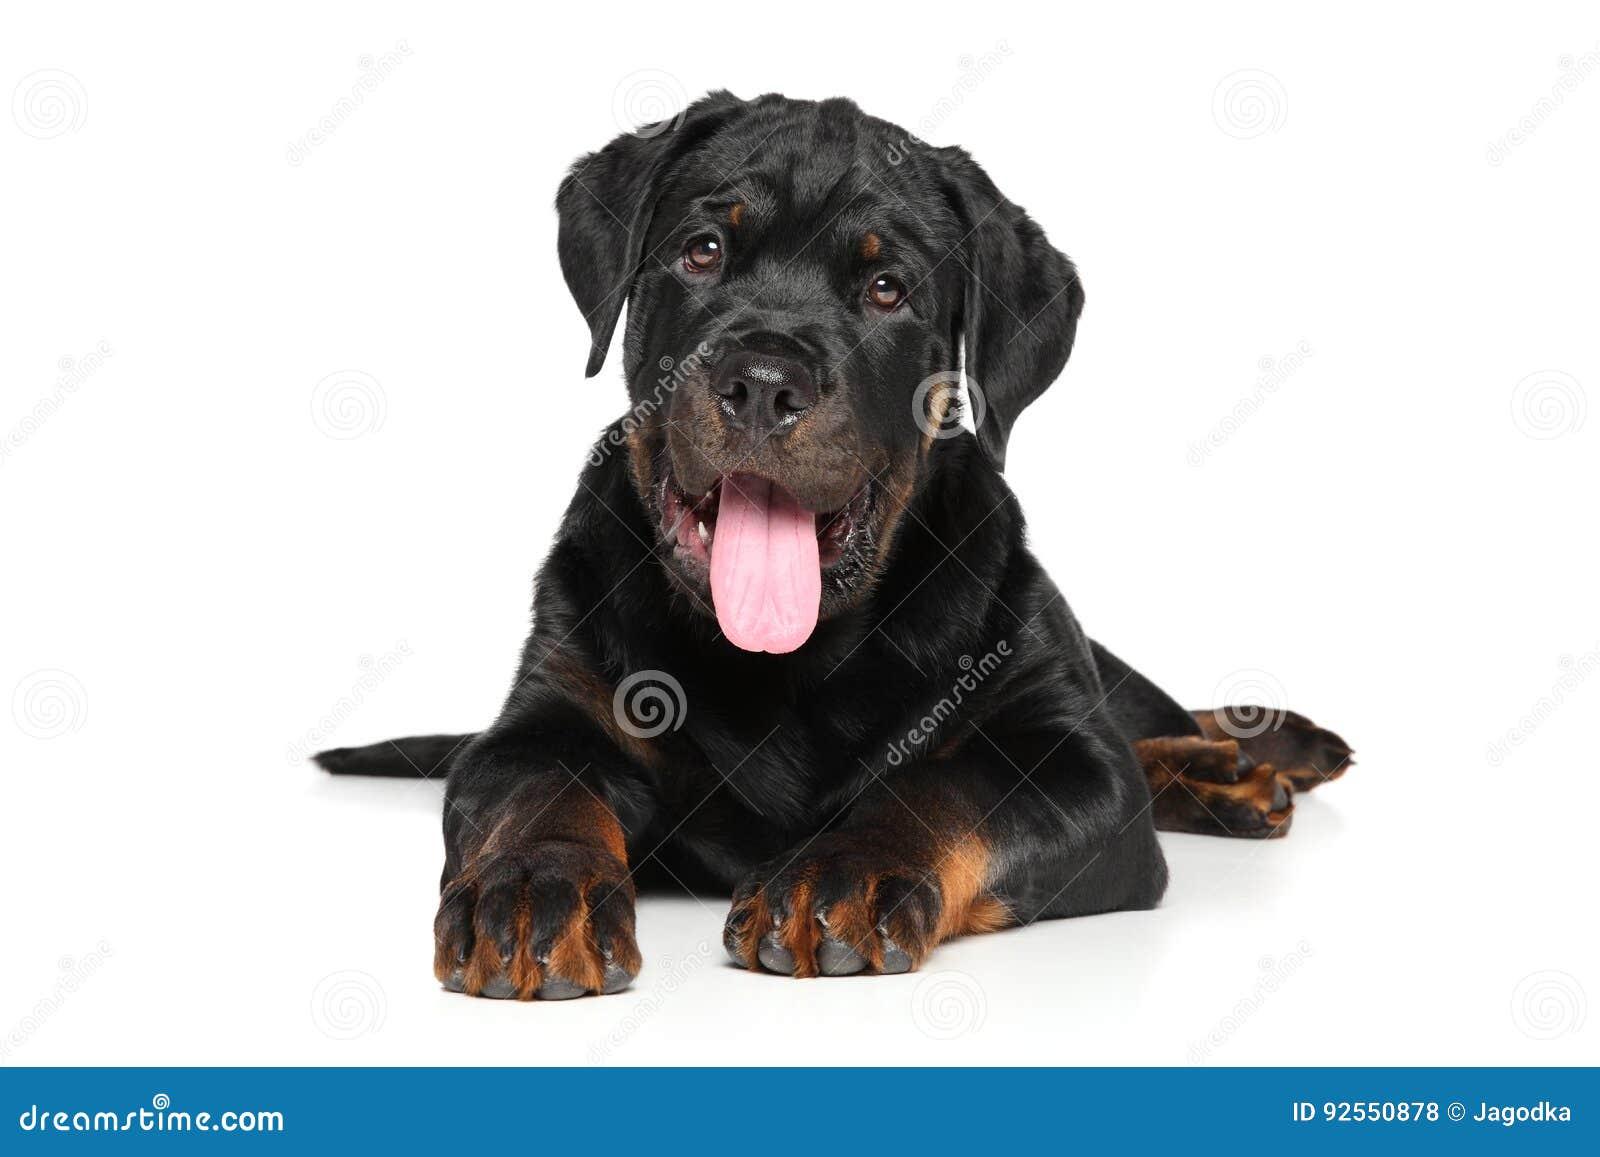 Cucciolo di Rottweiler su fondo bianco